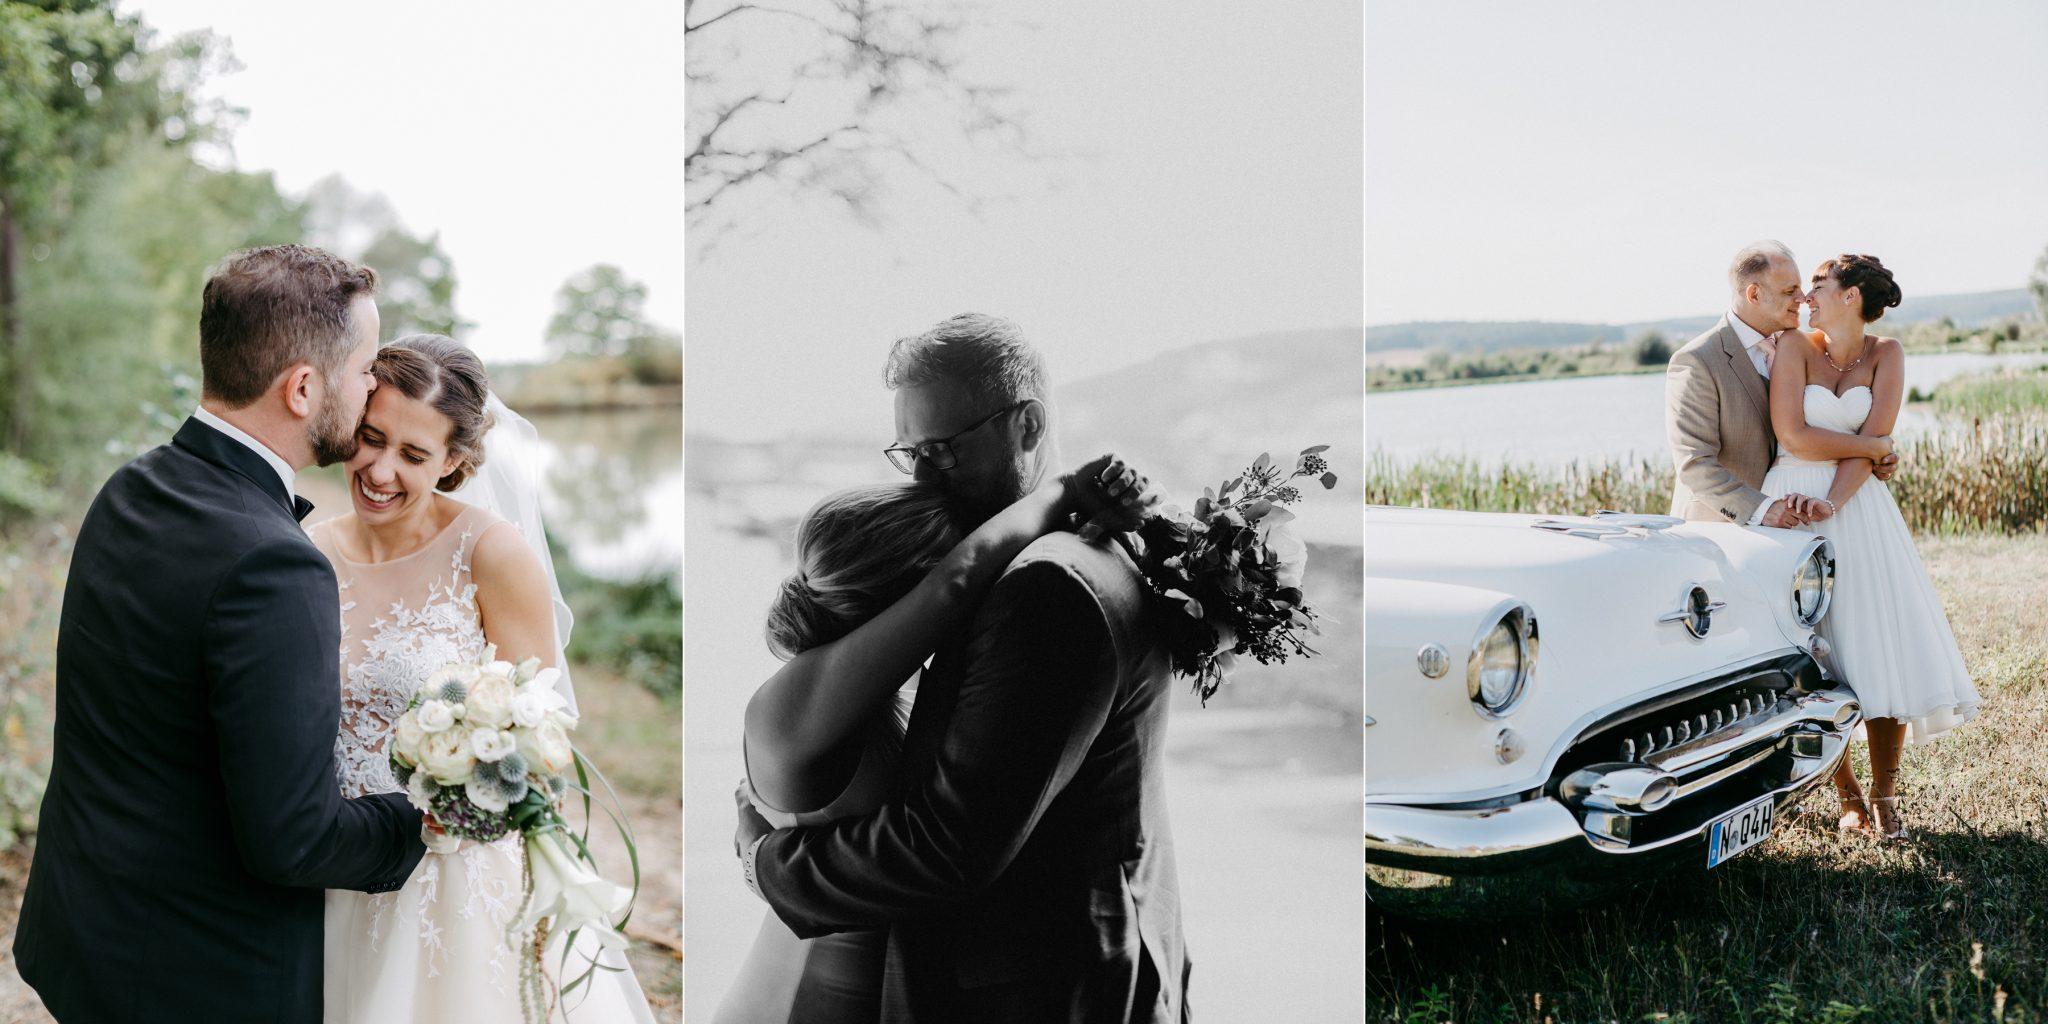 Hochzeitsfotografin Juliane Kaeppel - natural authentic wedding photography